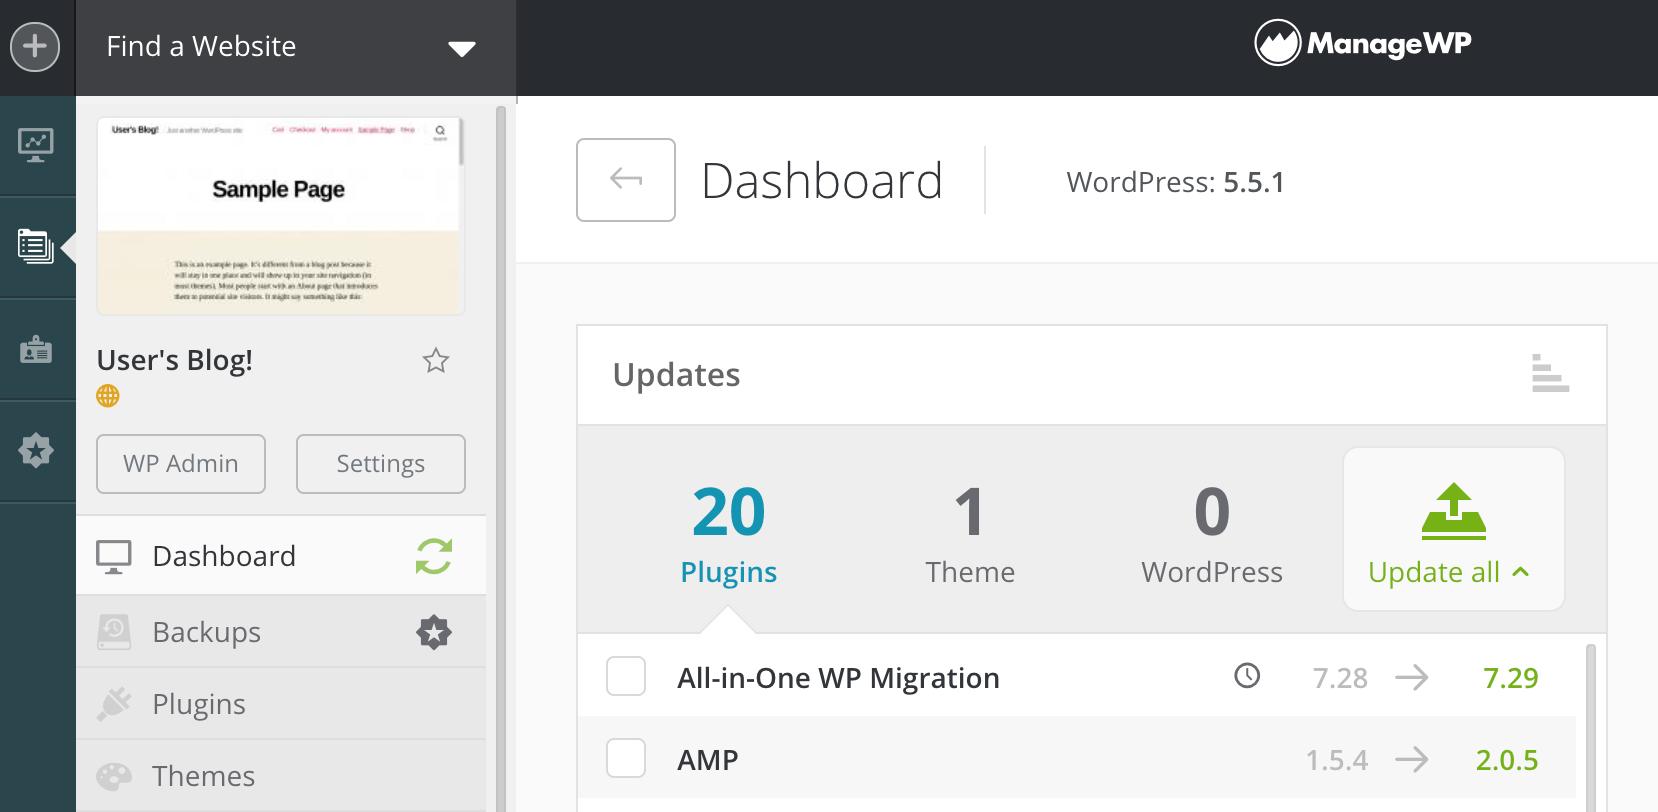 The ManageWP dashboard.